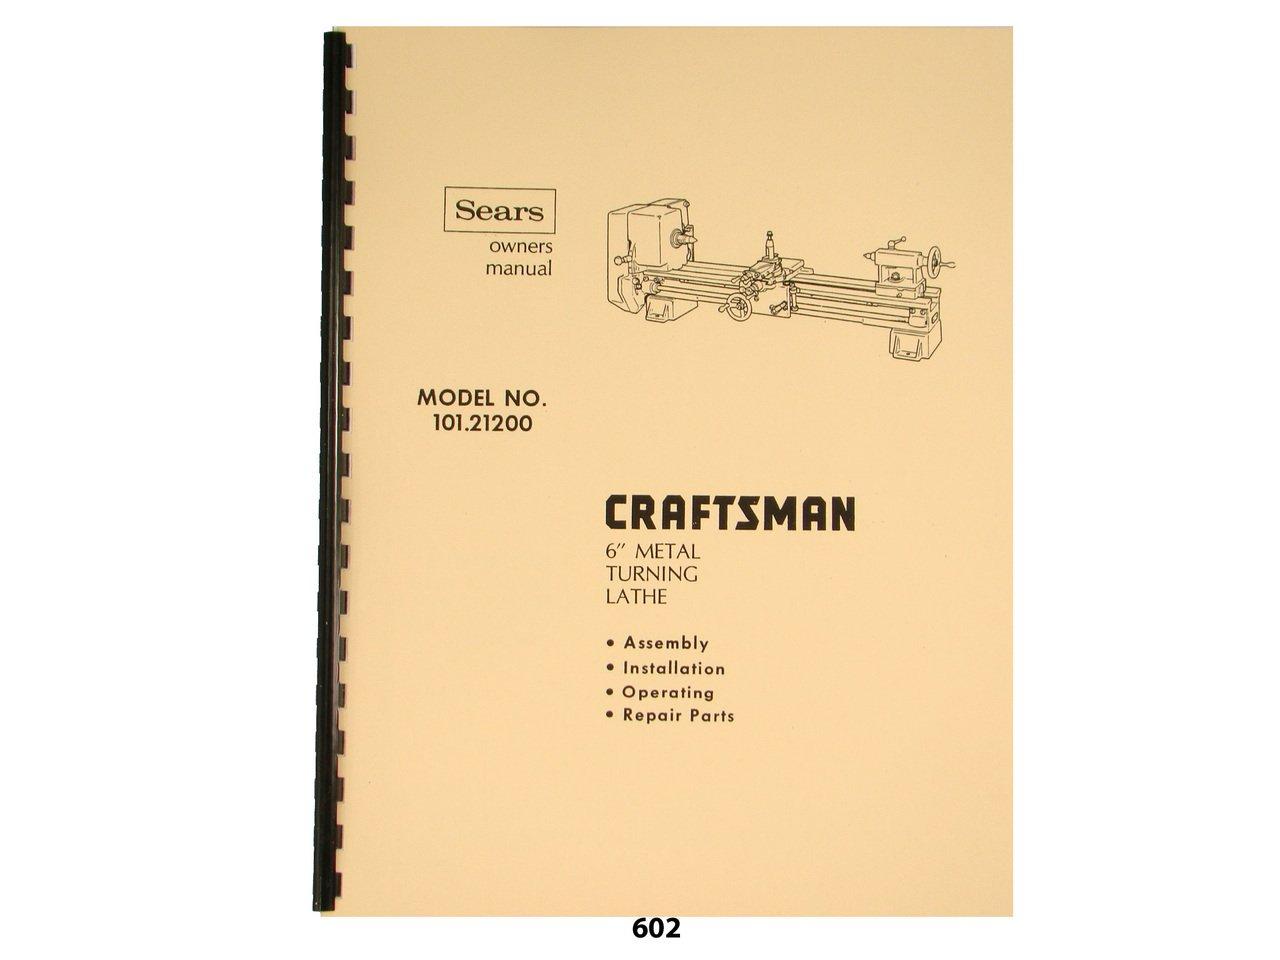 "Sears Craftsman 6"" Metal Lathe 101.21200 Operation and Parts List Manual: Sears  Craftsman: Amazon.com: Books"